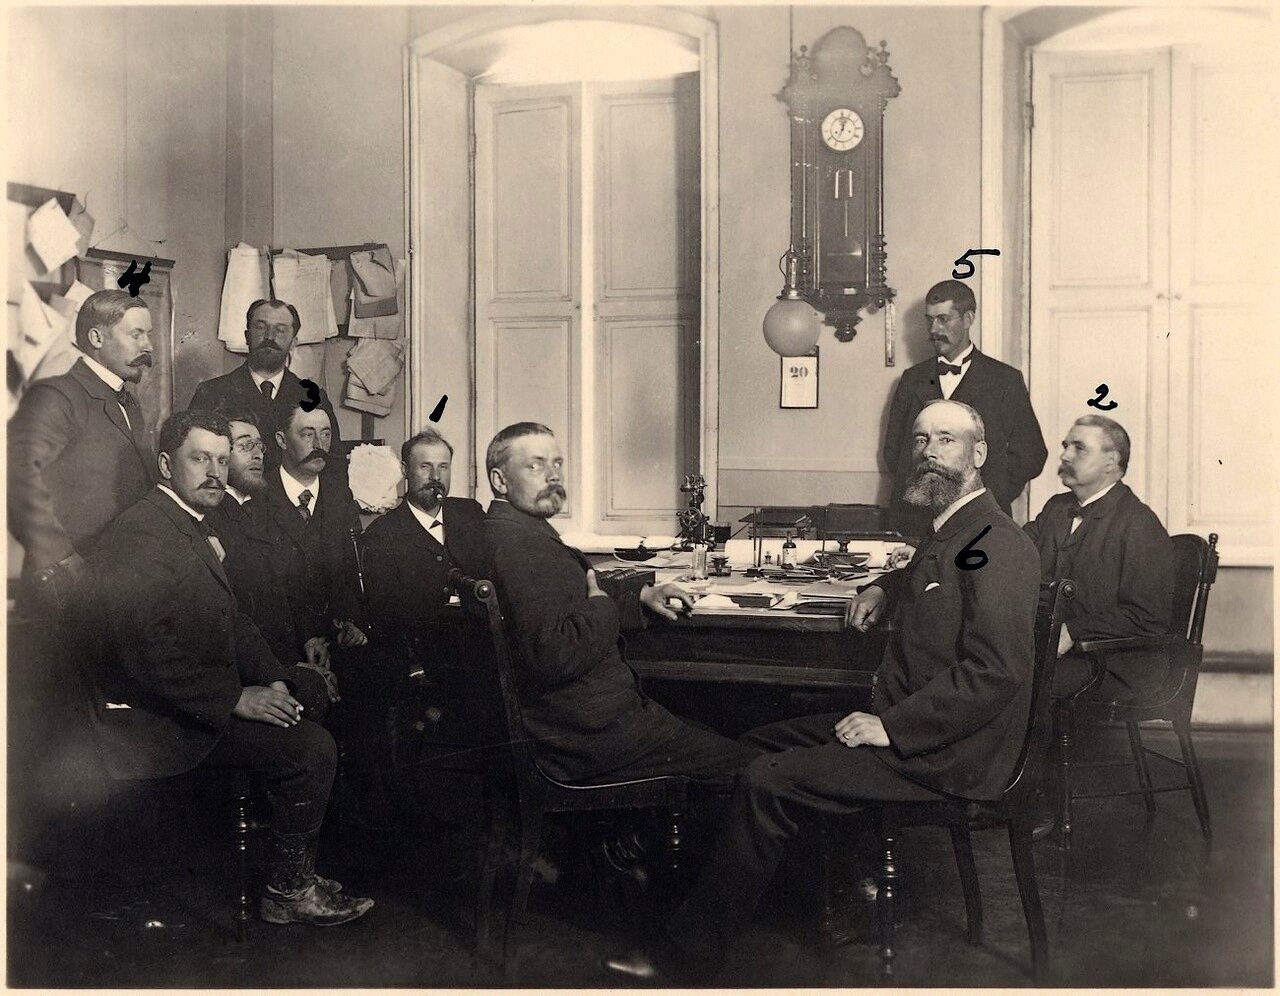 Роберт и Людвиг Нобели со своими сотрудниками в Баку